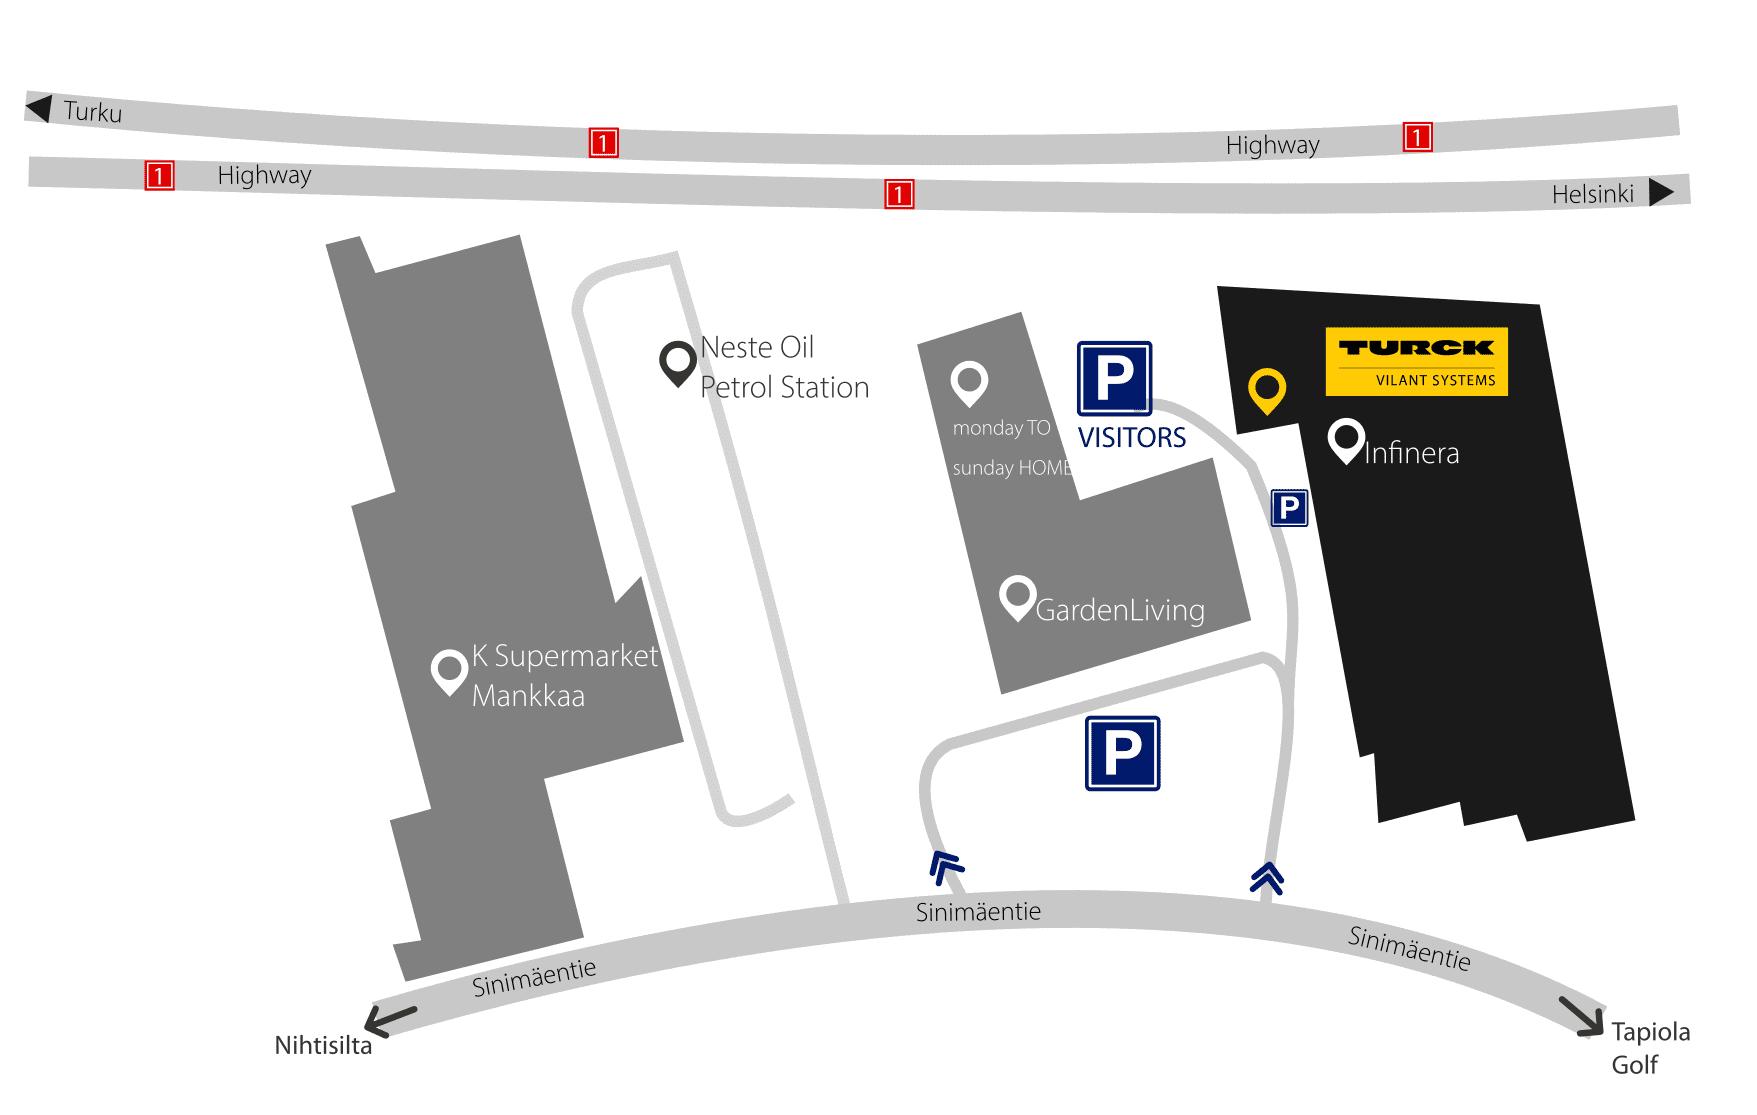 Visit Turck Vilant Systems Espoo office